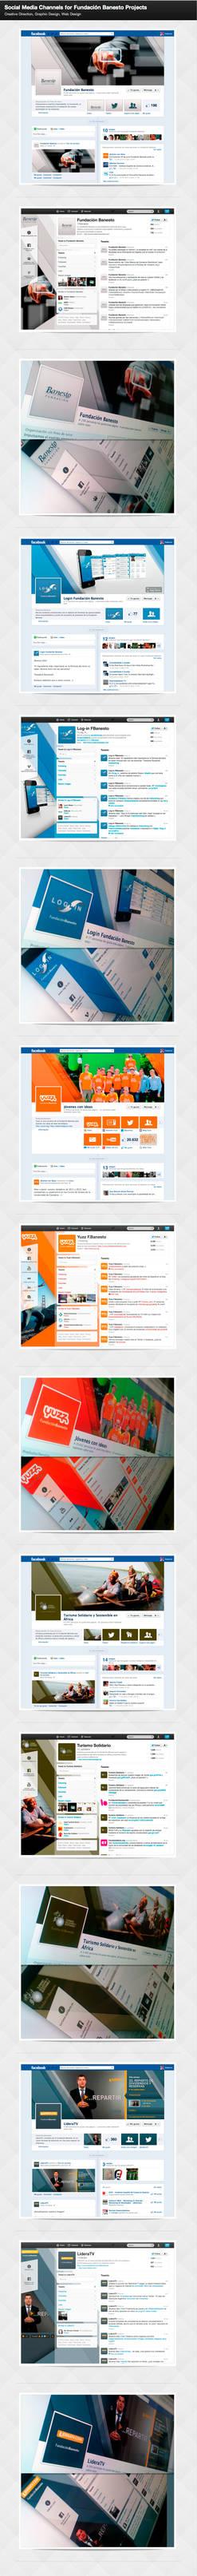 Social Media Channels for Banesto Fundation